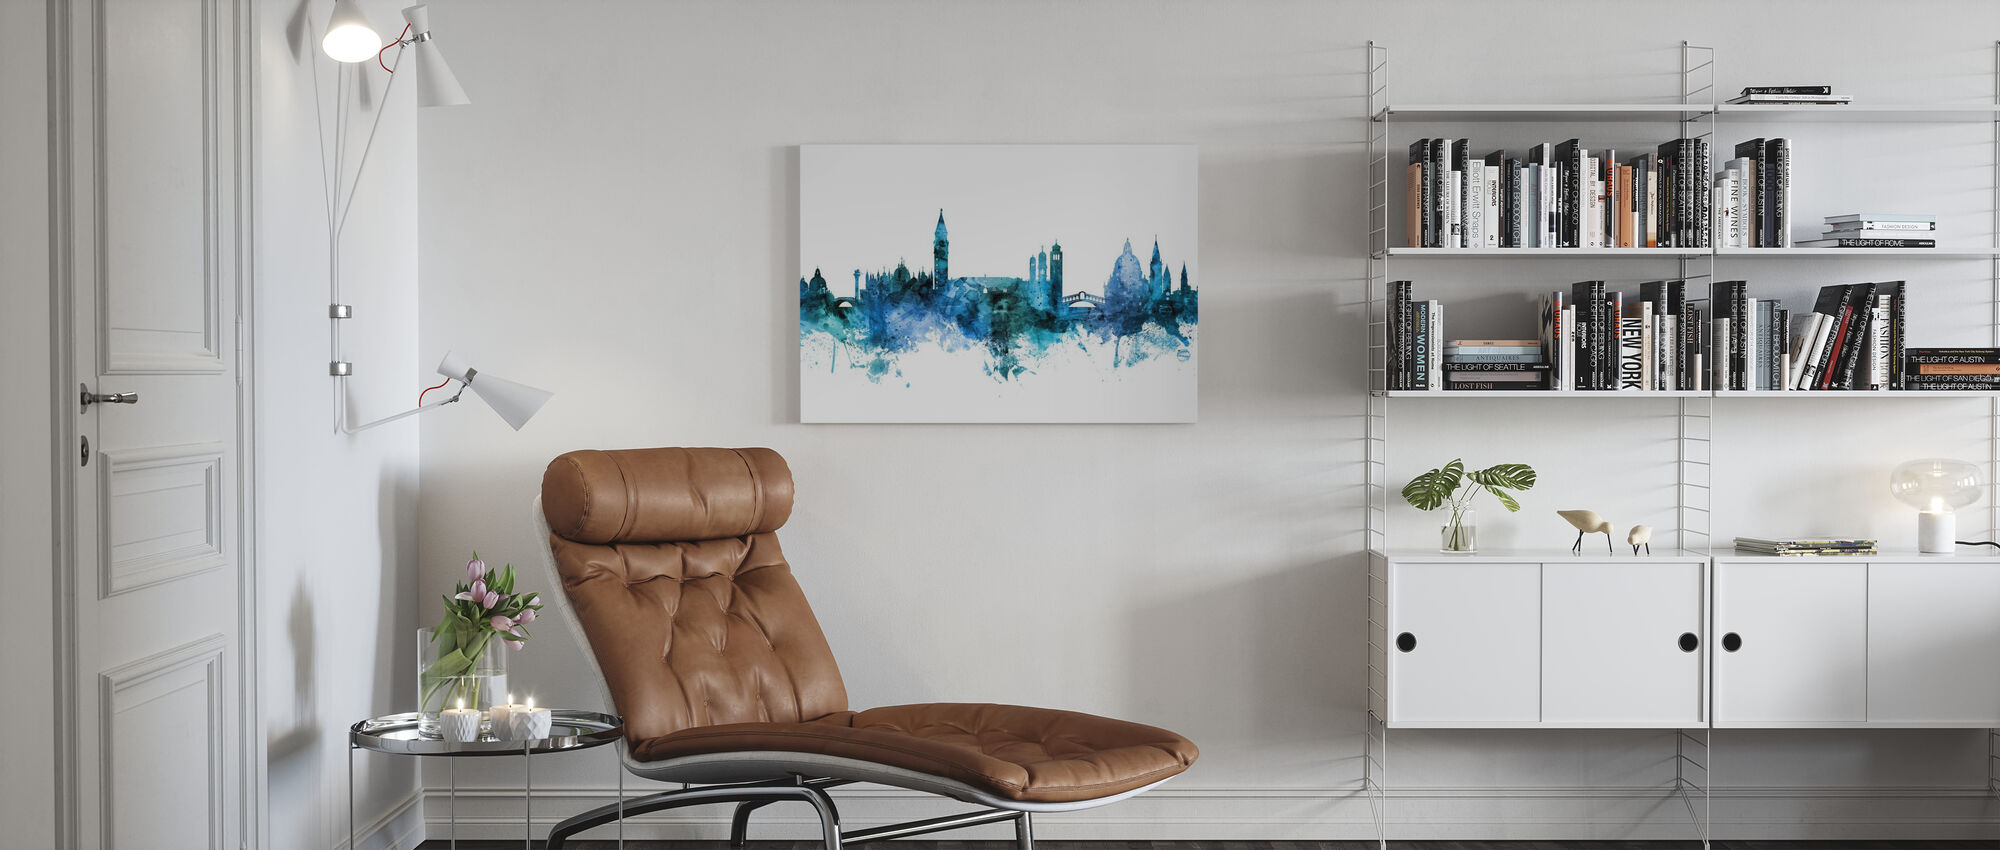 Venice Italy Skyline - Canvas print - Living Room